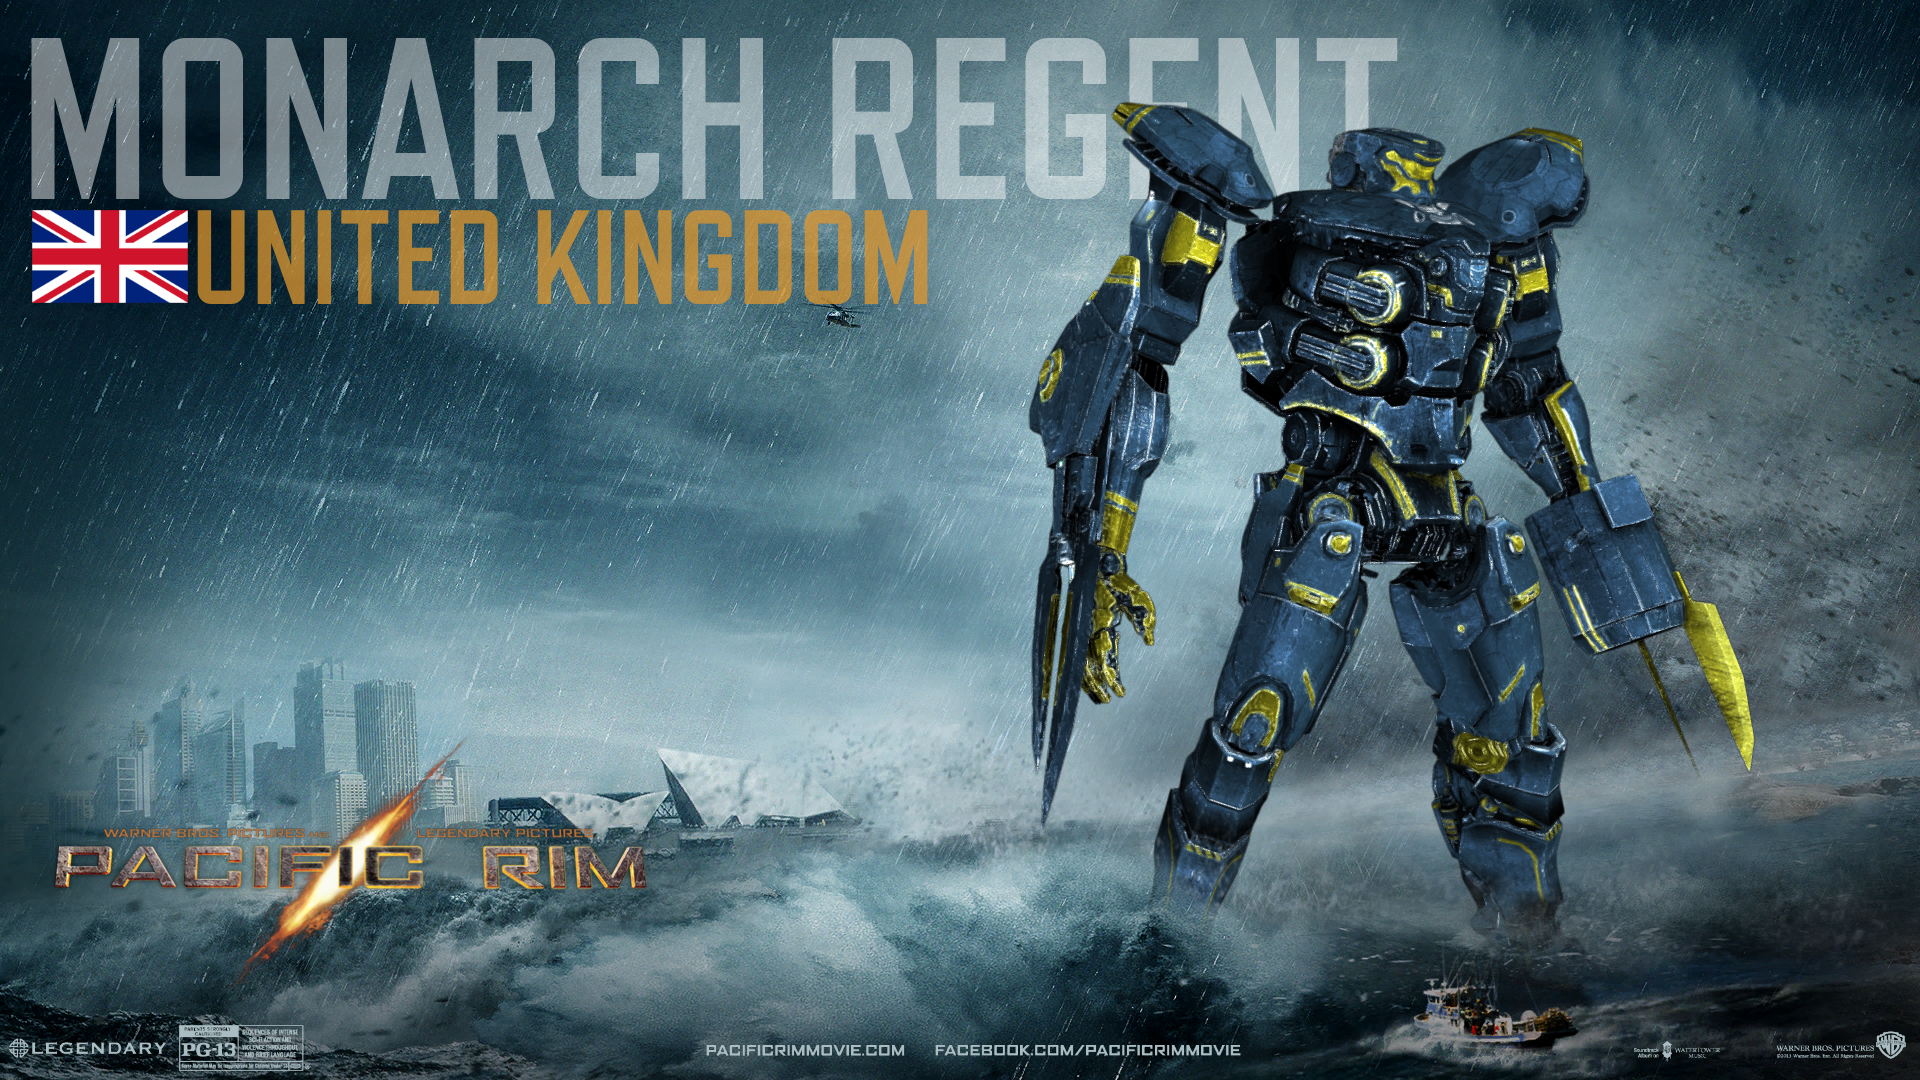 Monarch Regent | Custom Pacific Rim Wiki | FANDOM powered ... Pacific Rim Jaeger Countries